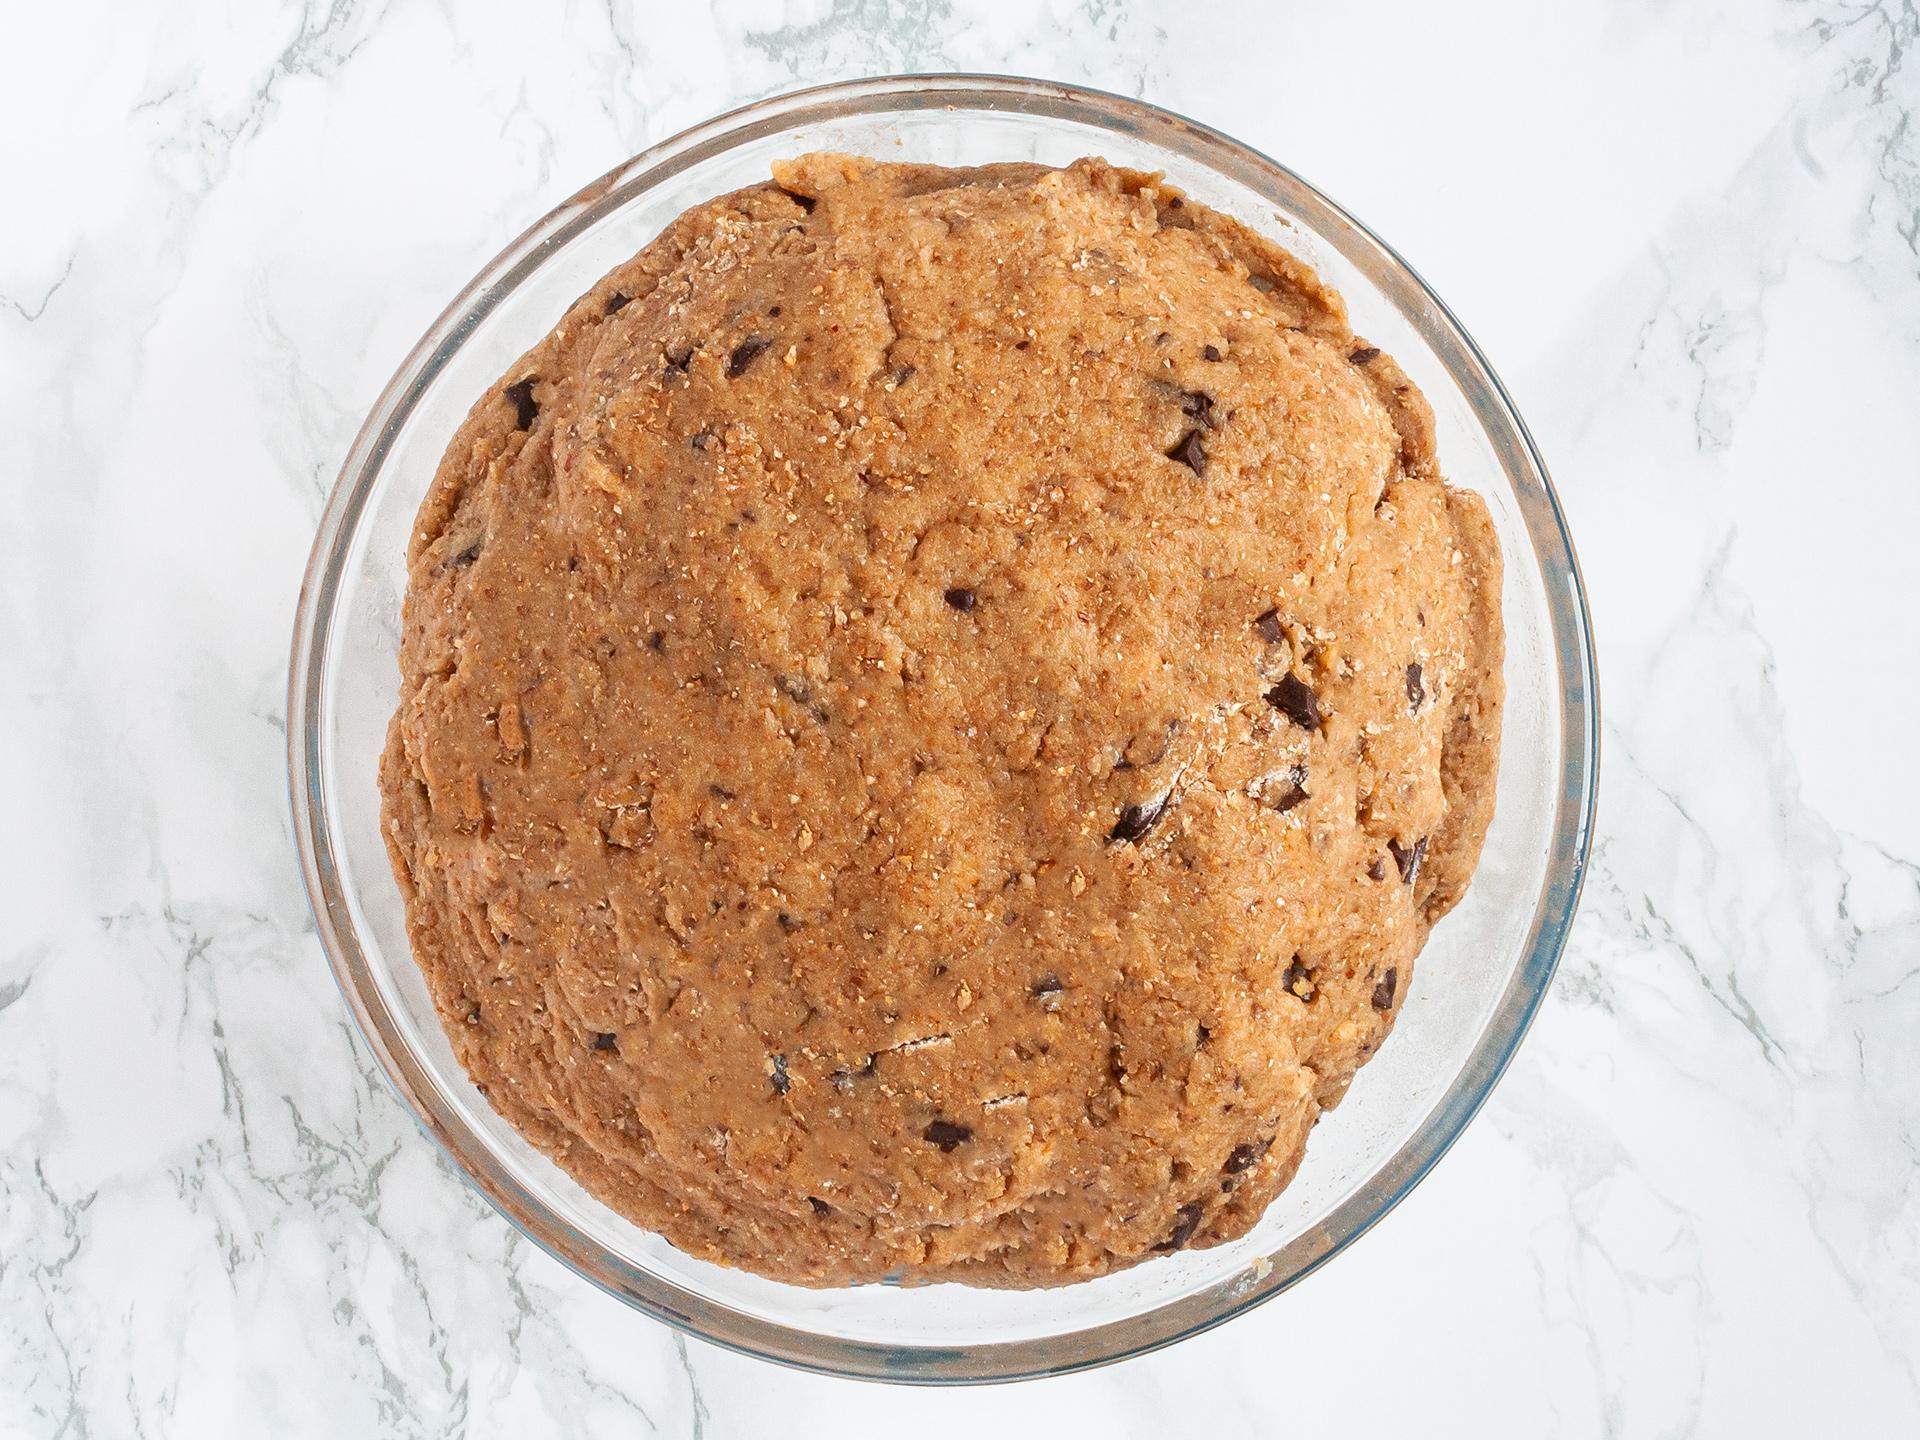 Step 2.1 of Vegan Peanut Butter Chocolate Chip Cookies Recipe